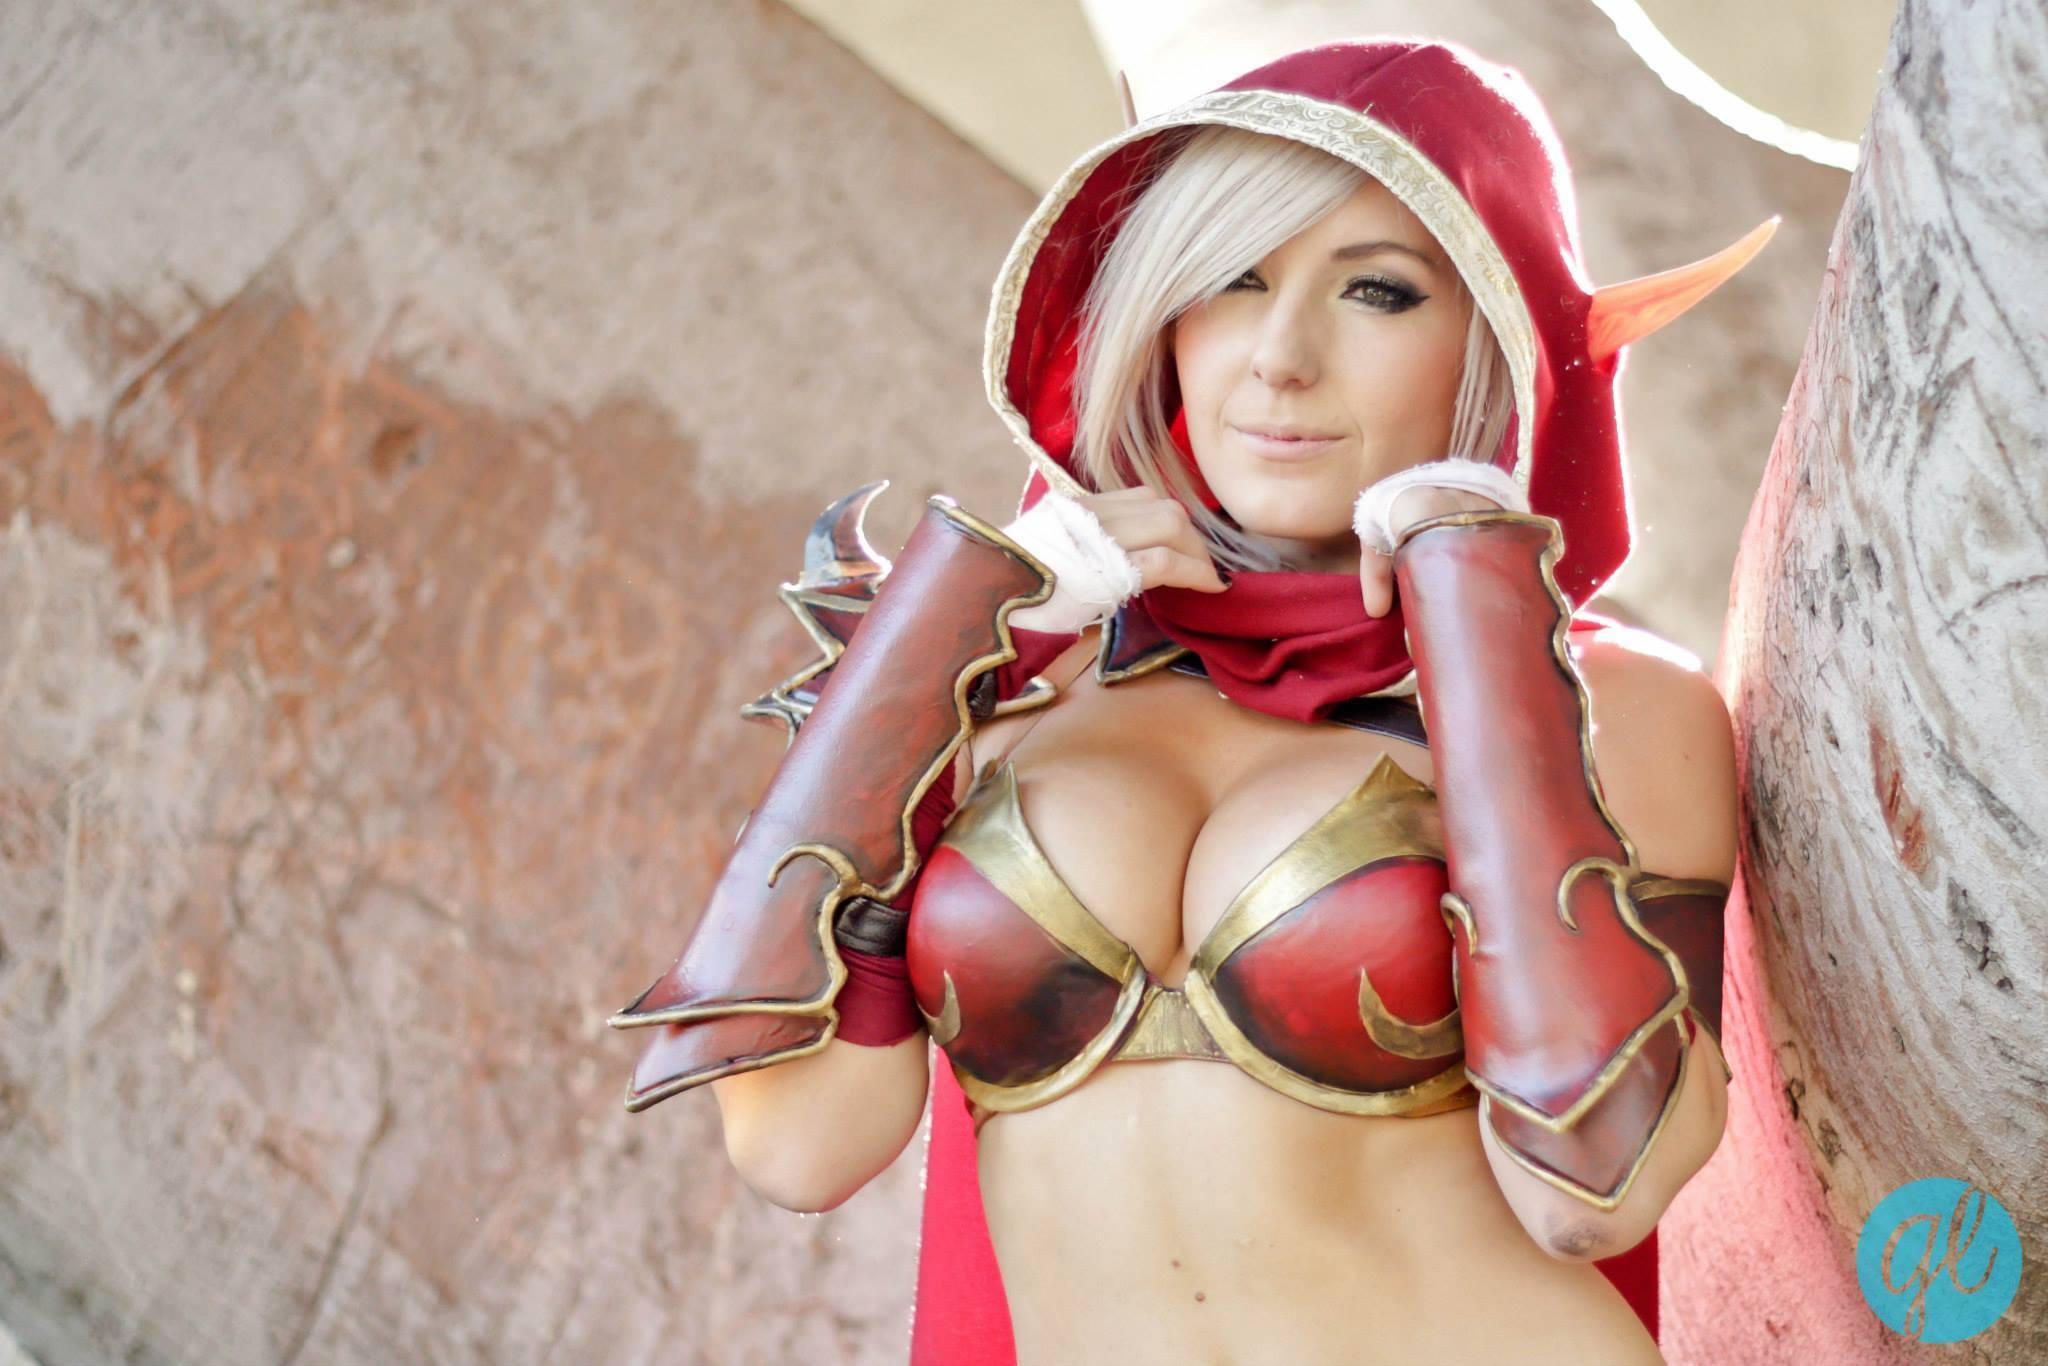 Man game cosplay girls naked cybersex